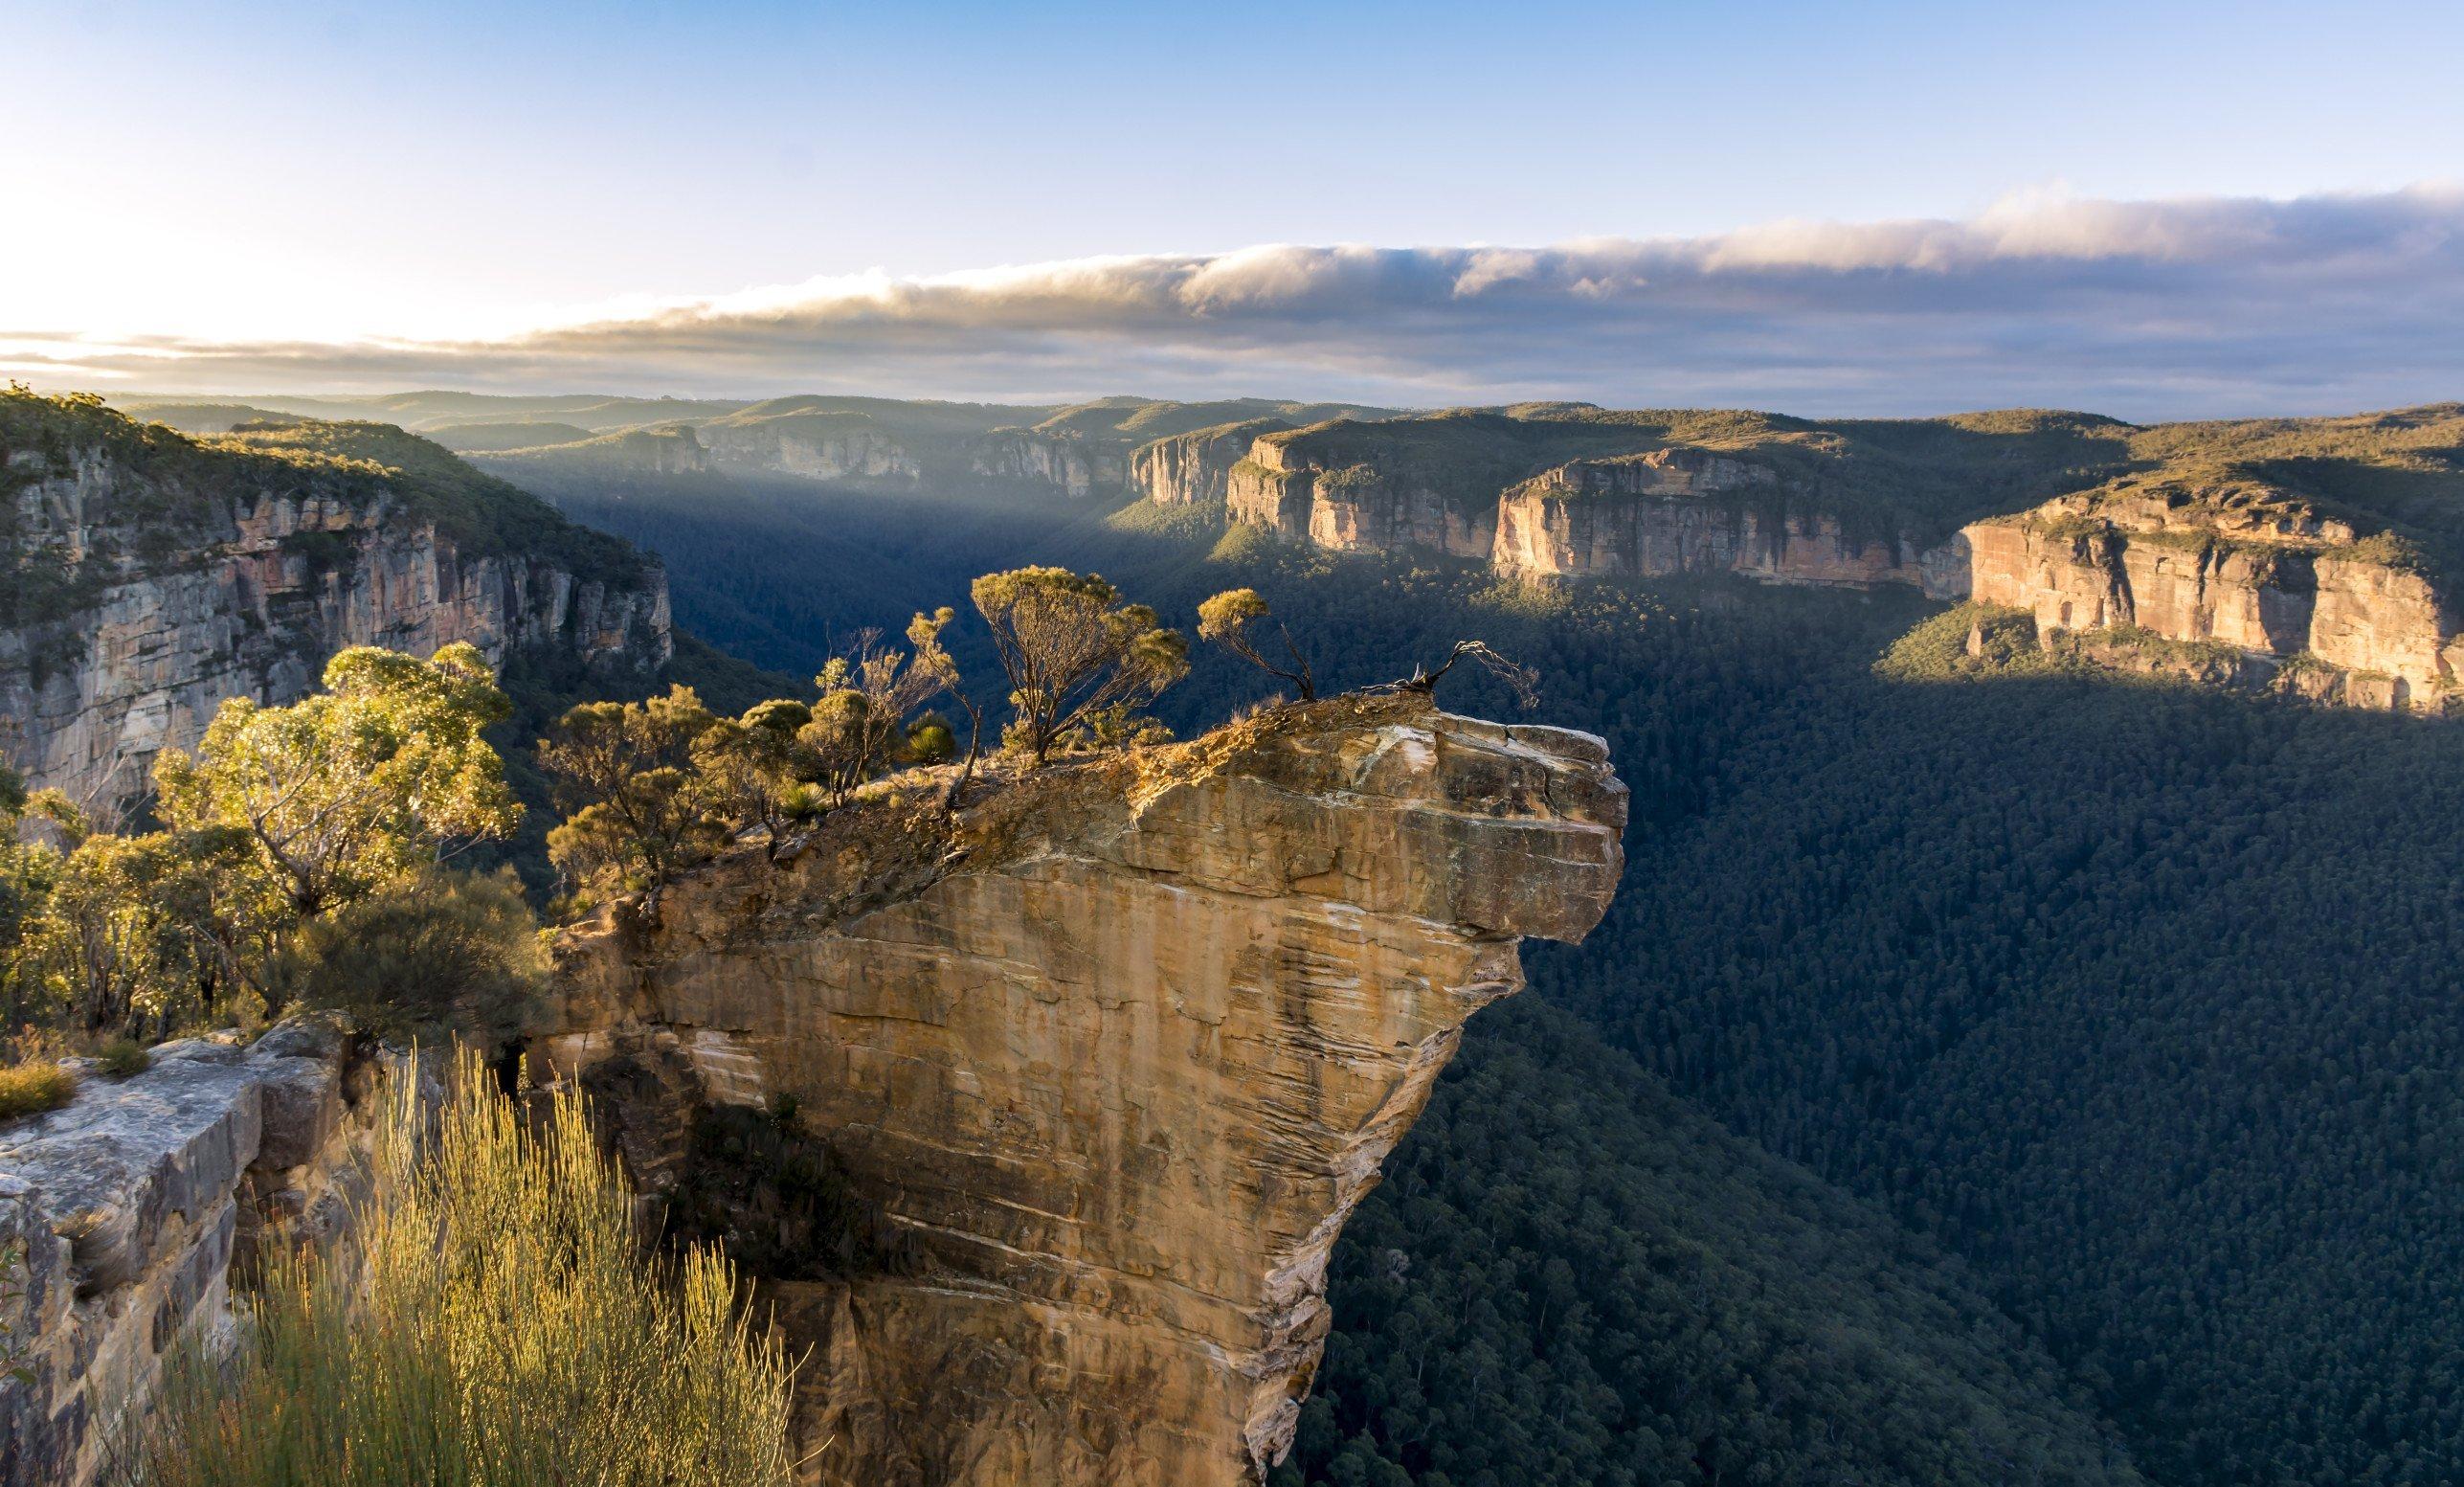 Hanging Rock in Victoria Australia Picnic at Hanging Rock by Joan Lindsay